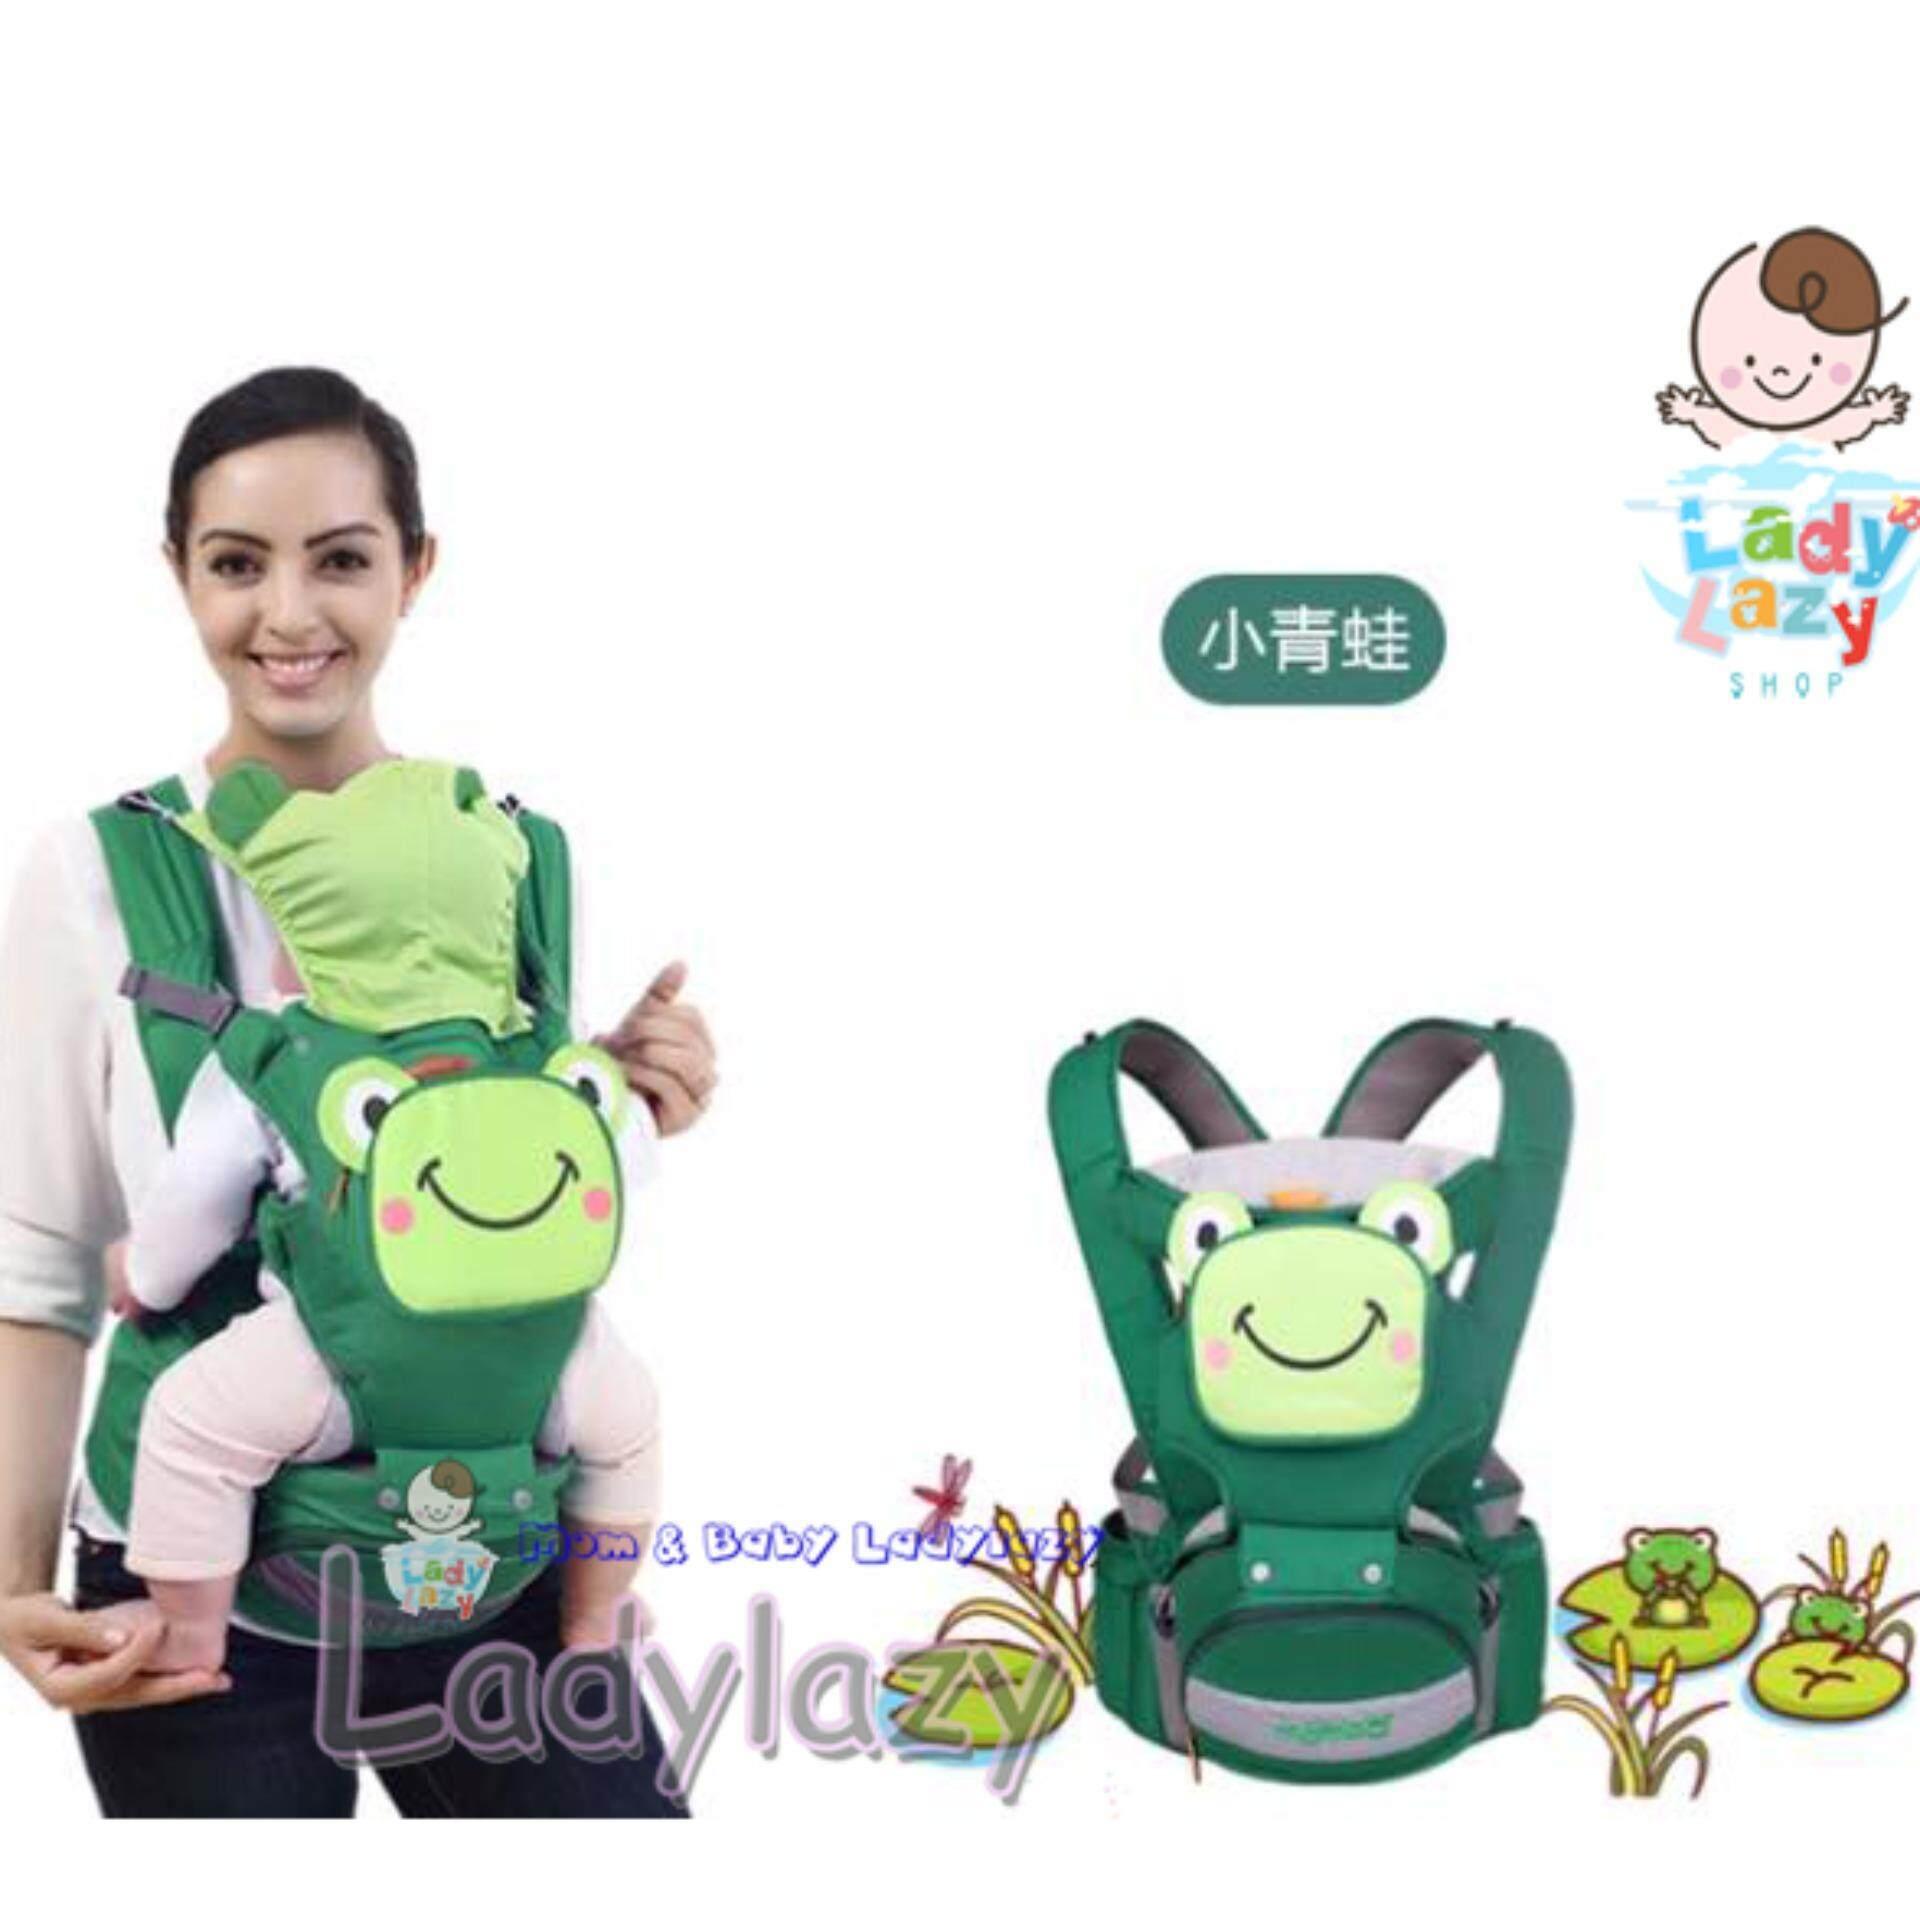 Ladylazy เป้อุ้มเด็ก 4in1 Hip Seat Carrier (กบน้อย สีเขียว) ร้านแนะนำ